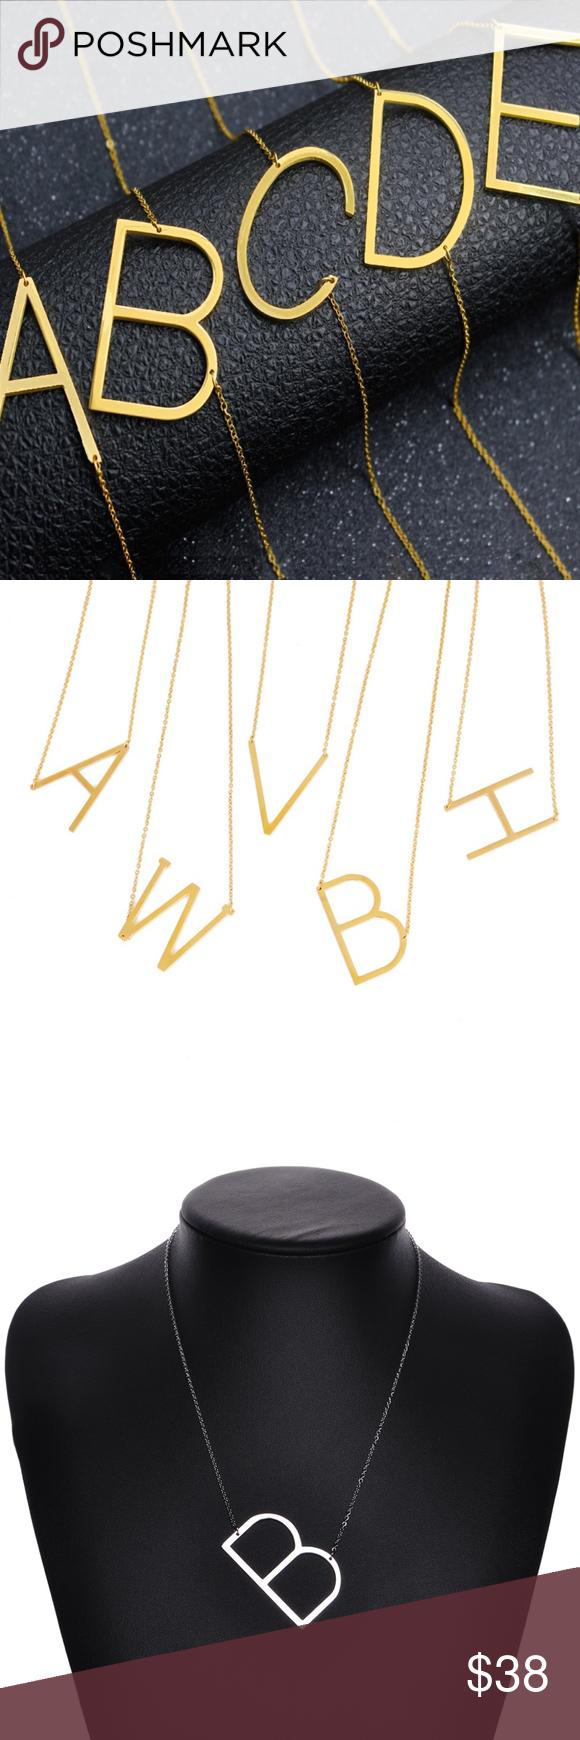 Monogram Gold Letter B Initial Pendant Necklace Initial Pendant Necklace Initial Pendant Silver Jewelry Fashion